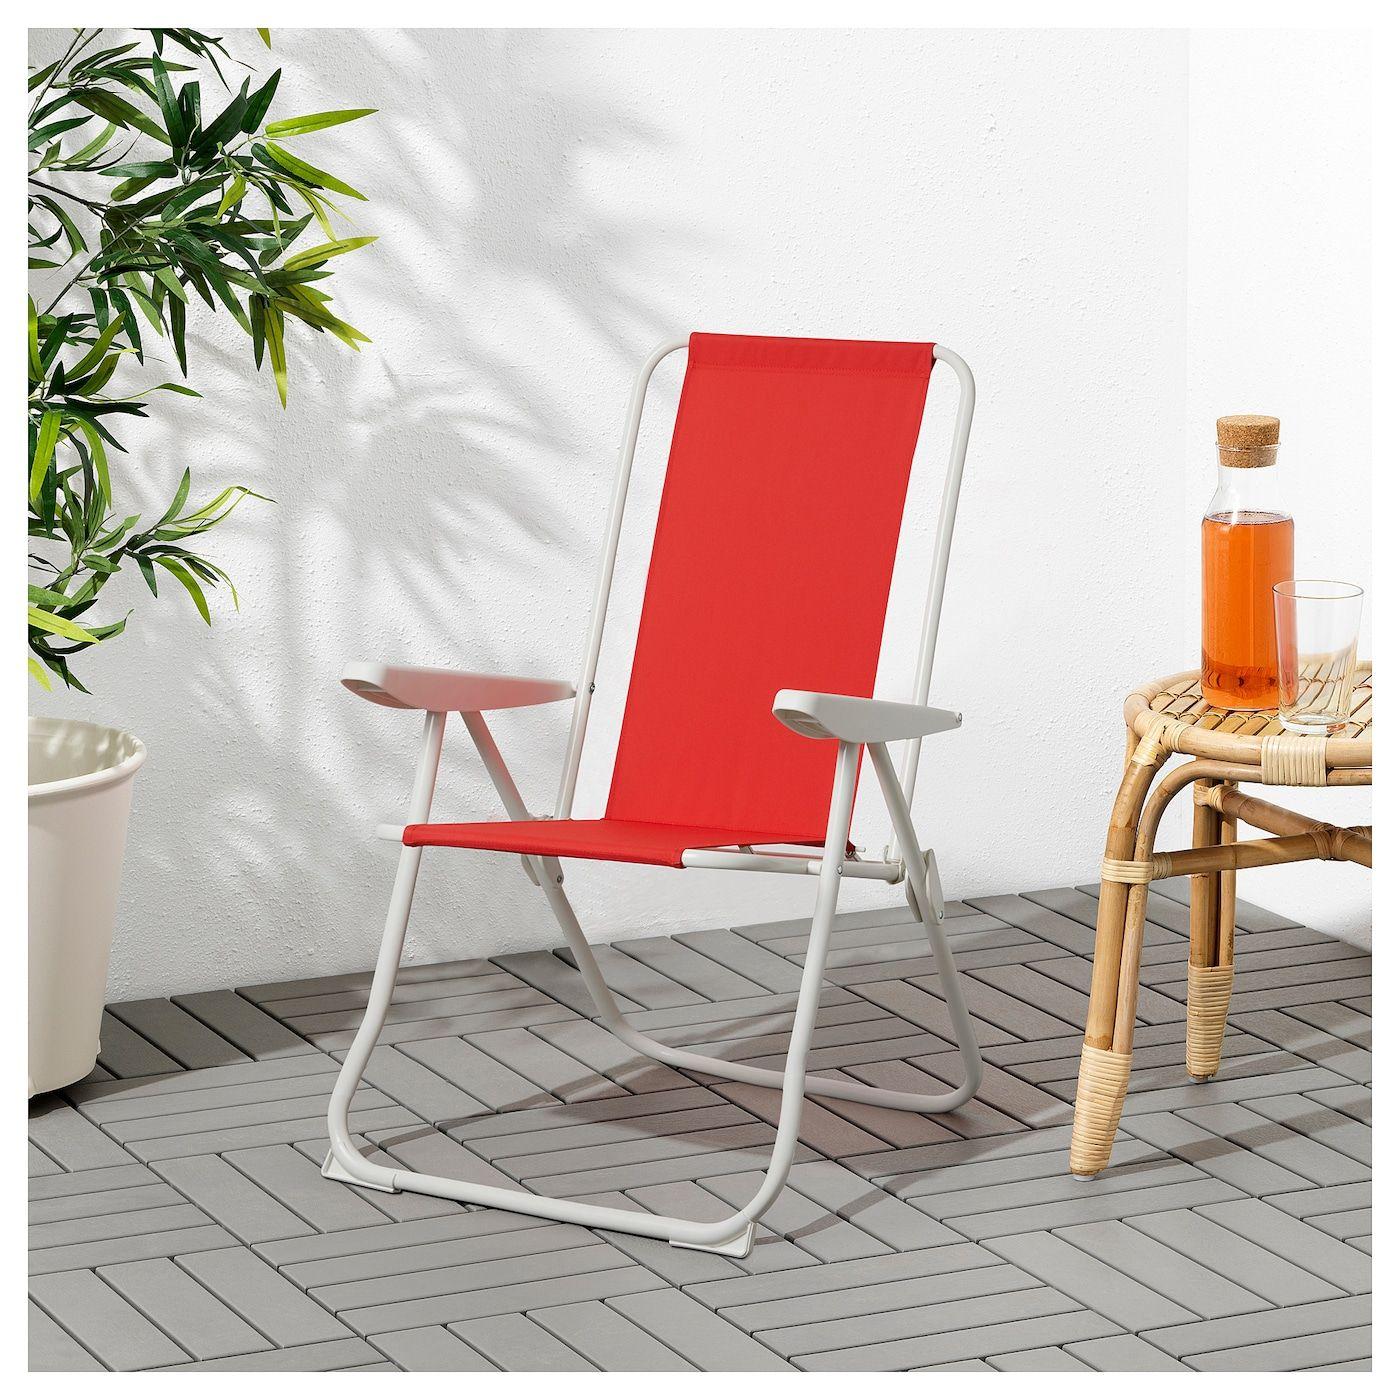 Håmö Reclining Chair - Red   Chaise Fauteuil, Fauteuil ... intérieur Chaises De Jardin Ikea